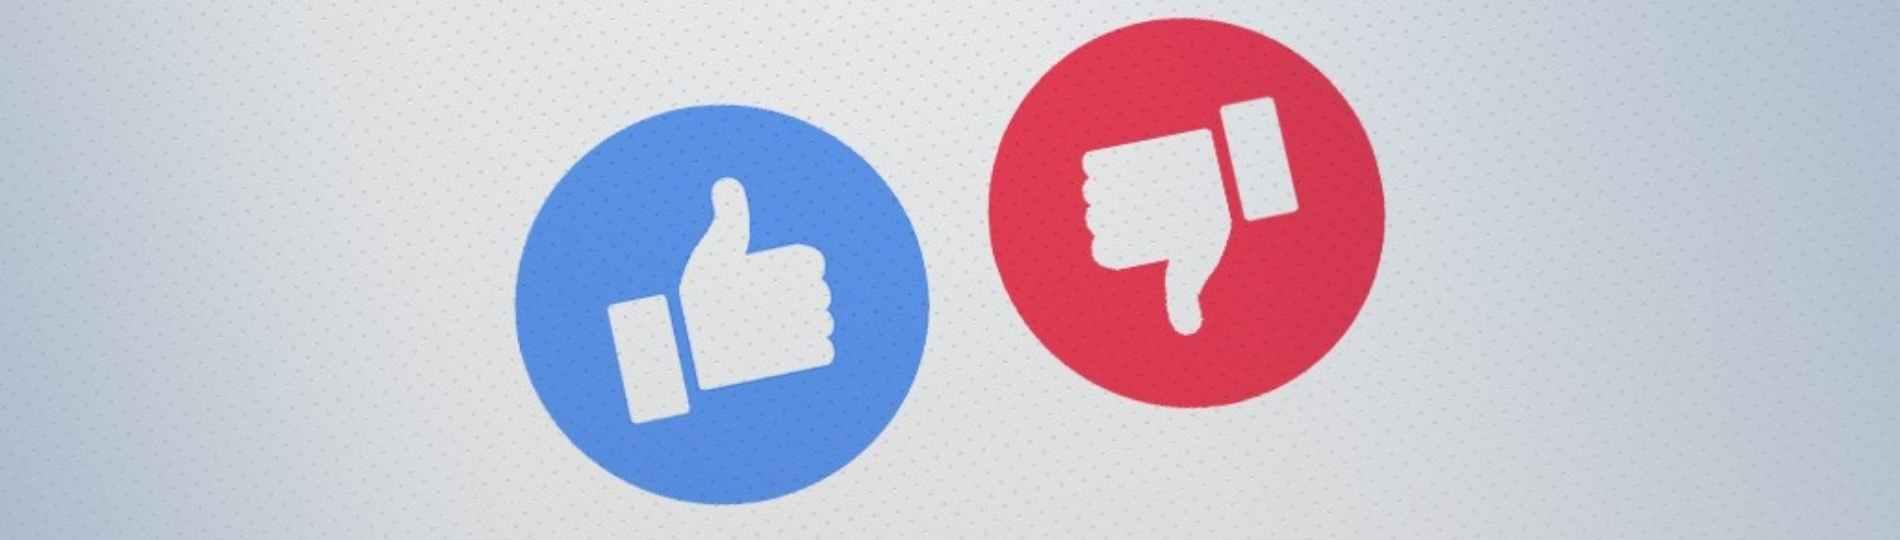 Social media hate